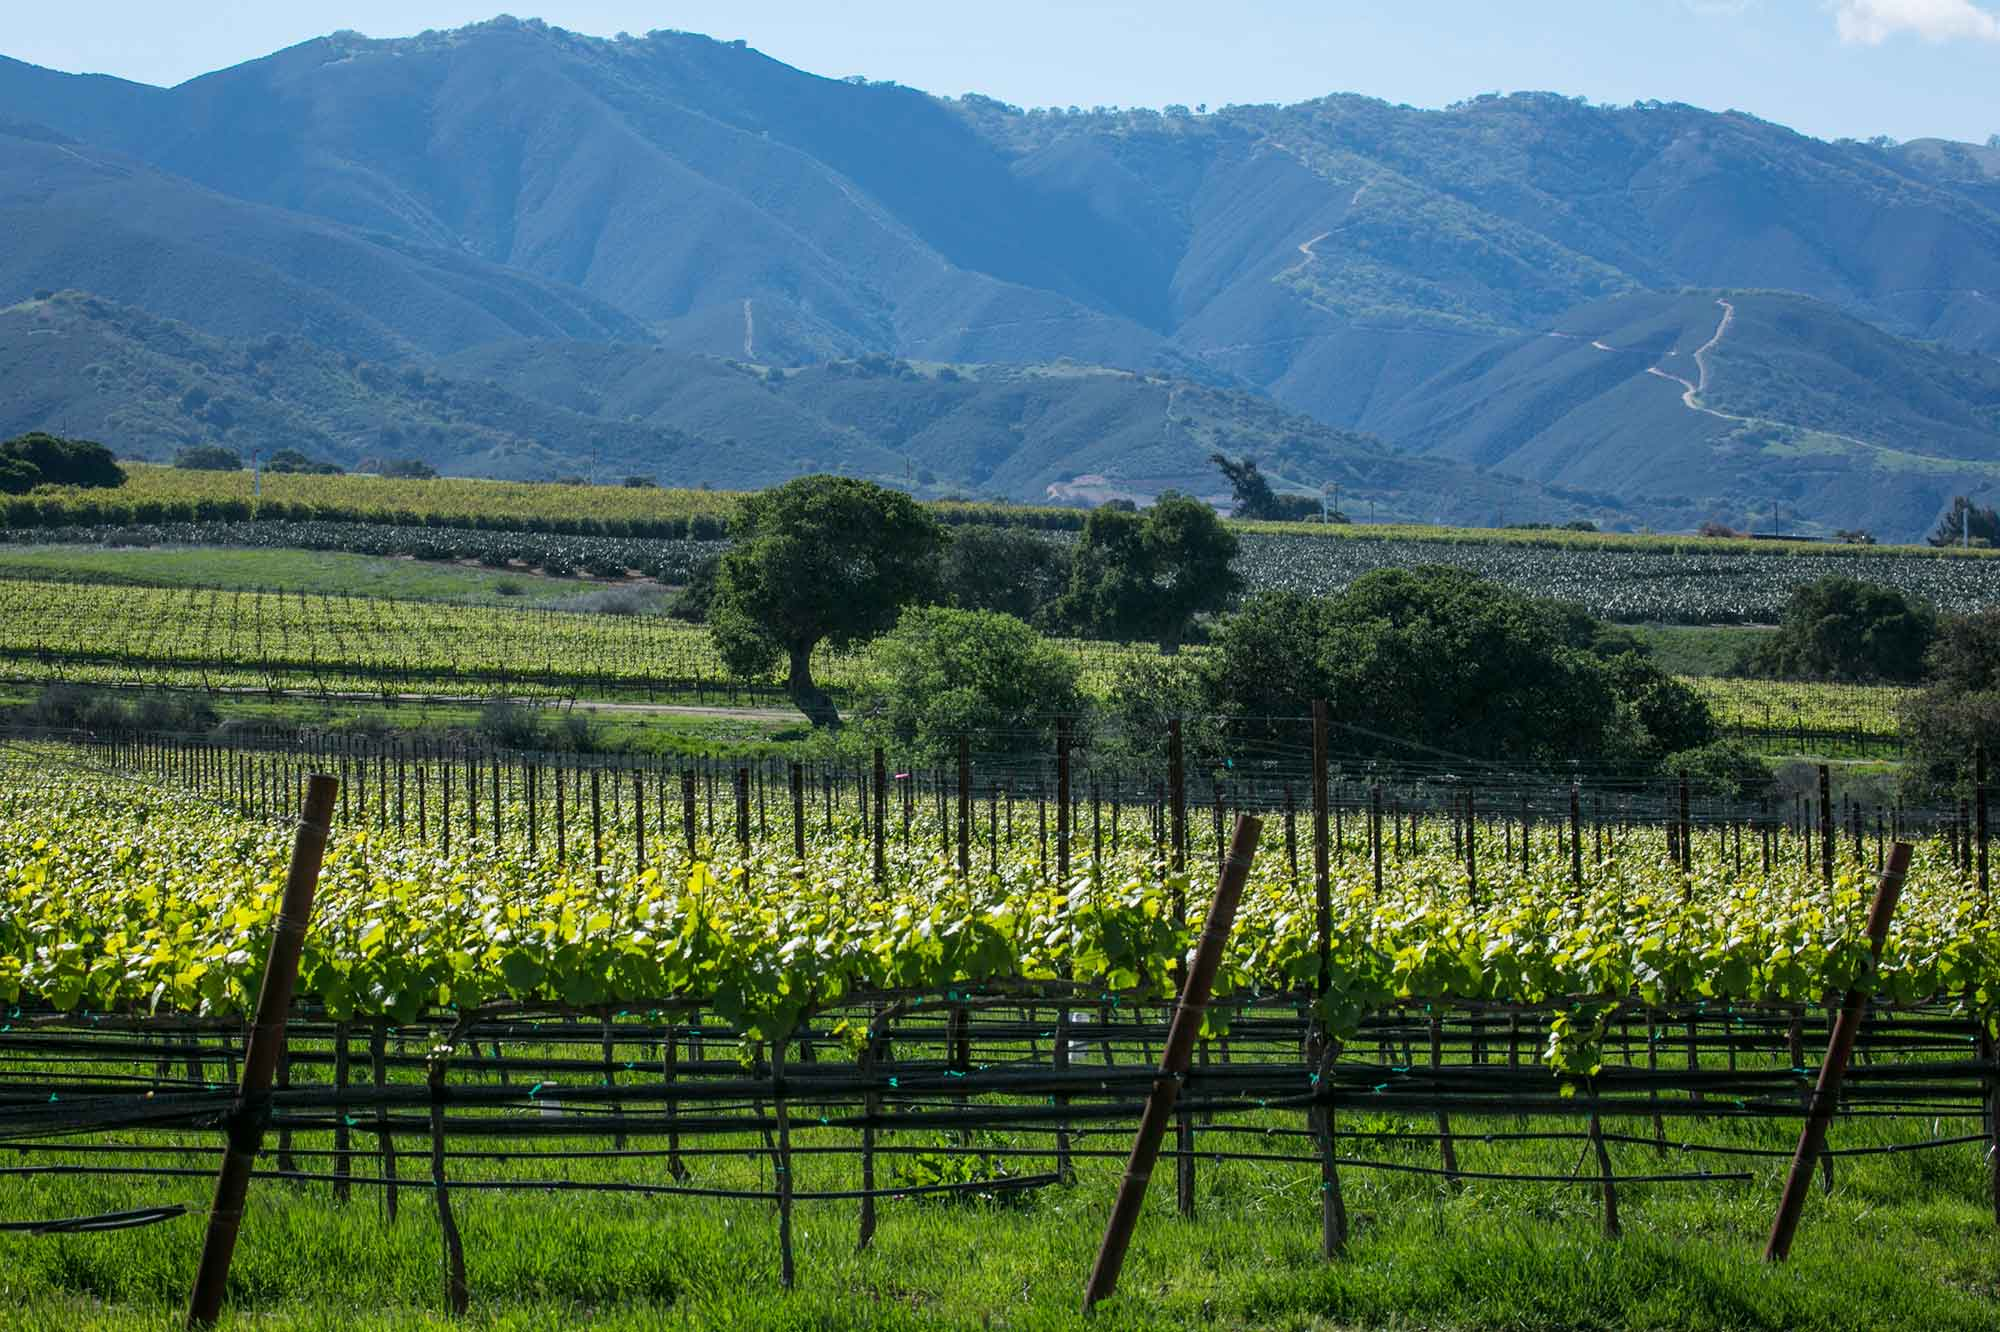 Scenic view of Soberanes Pinot Noir vineyard